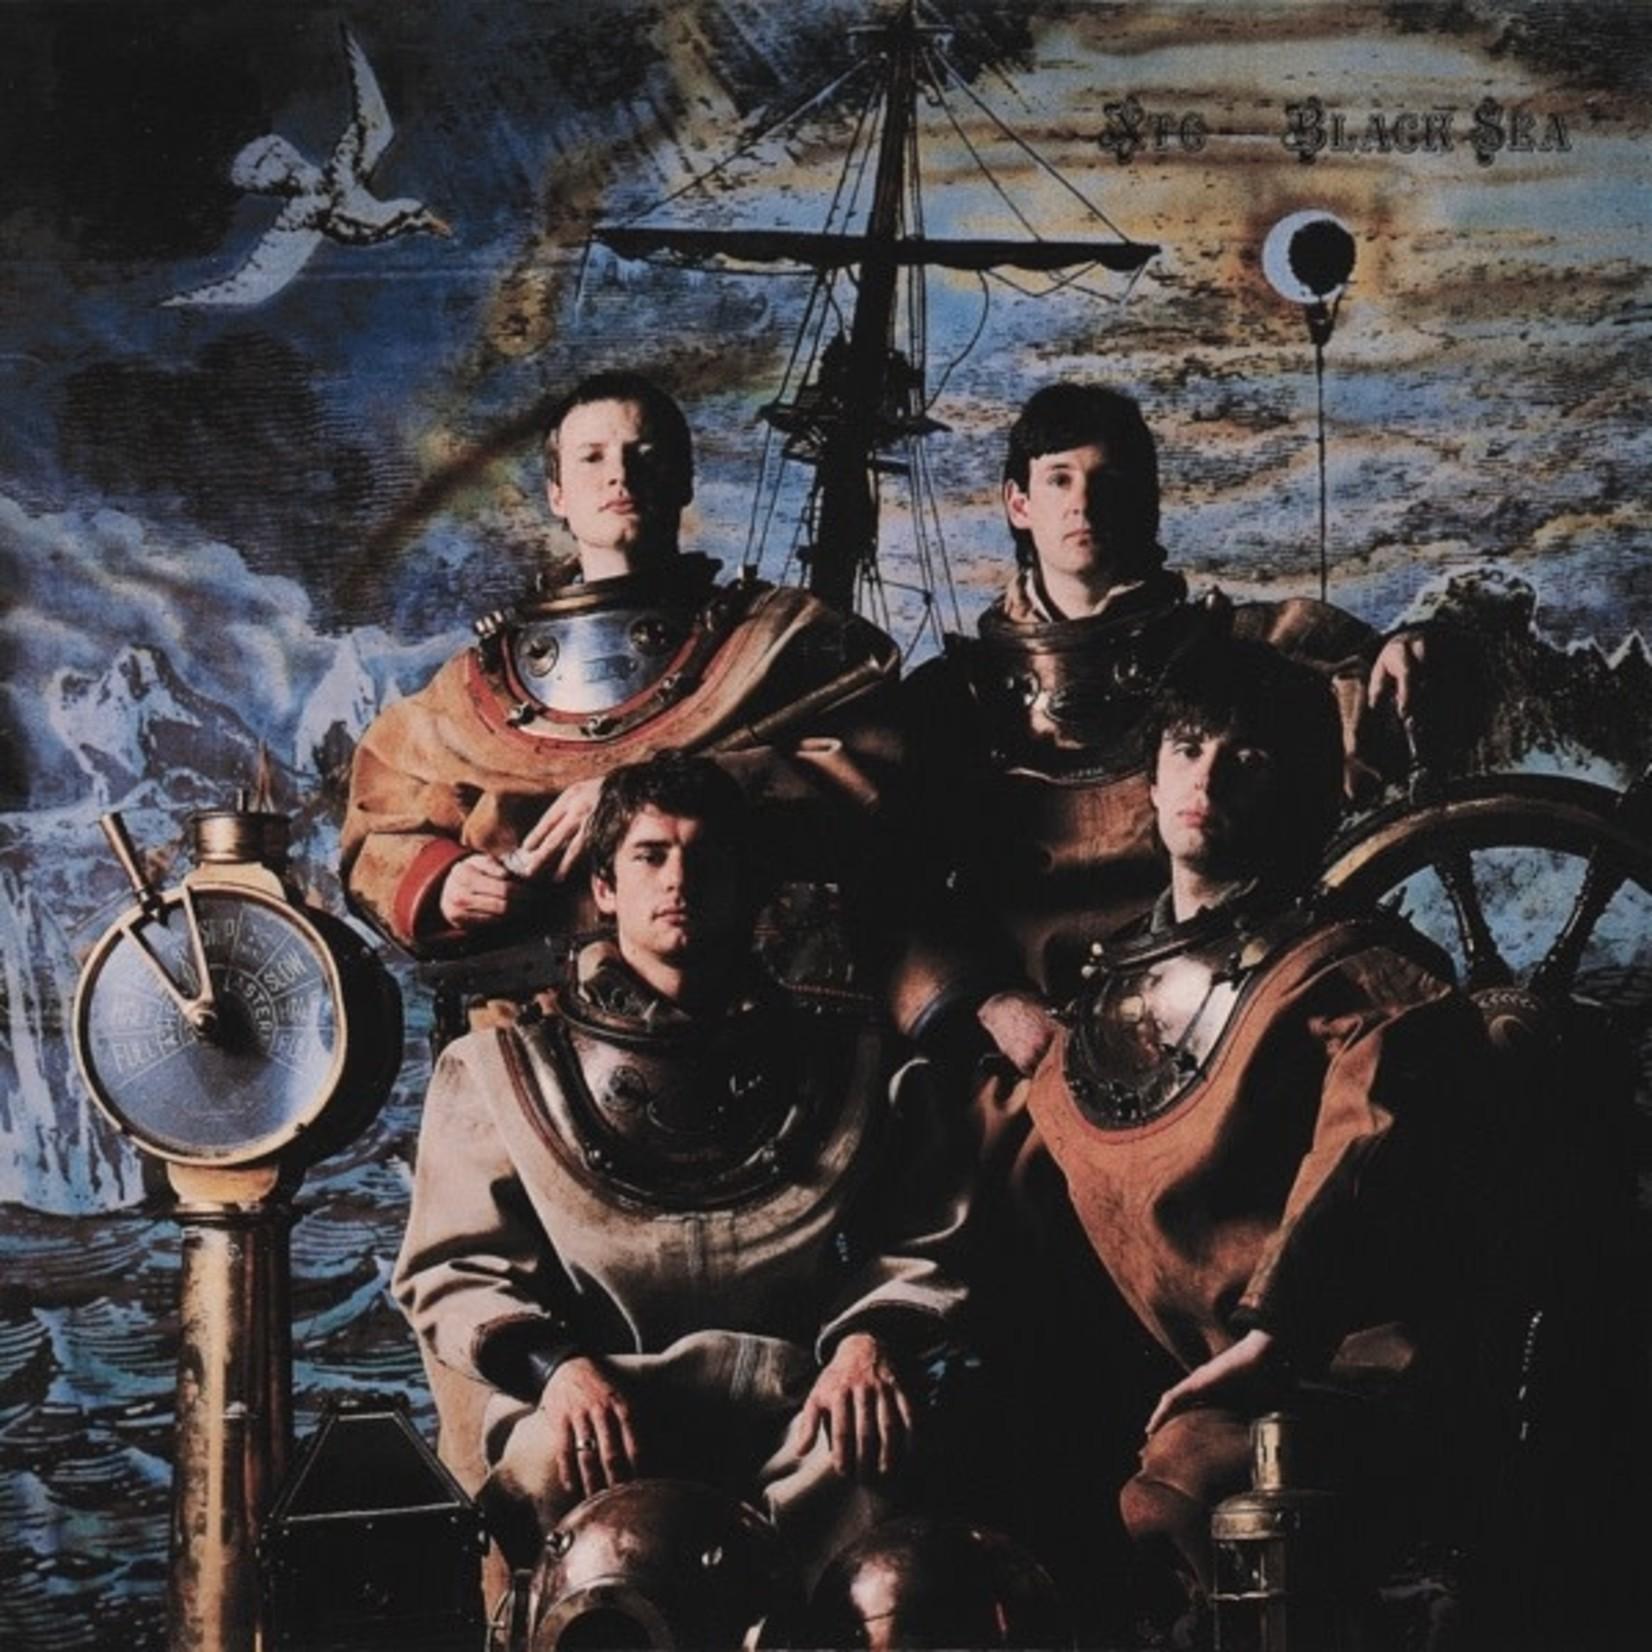 Vinyl XTC - Black Sea